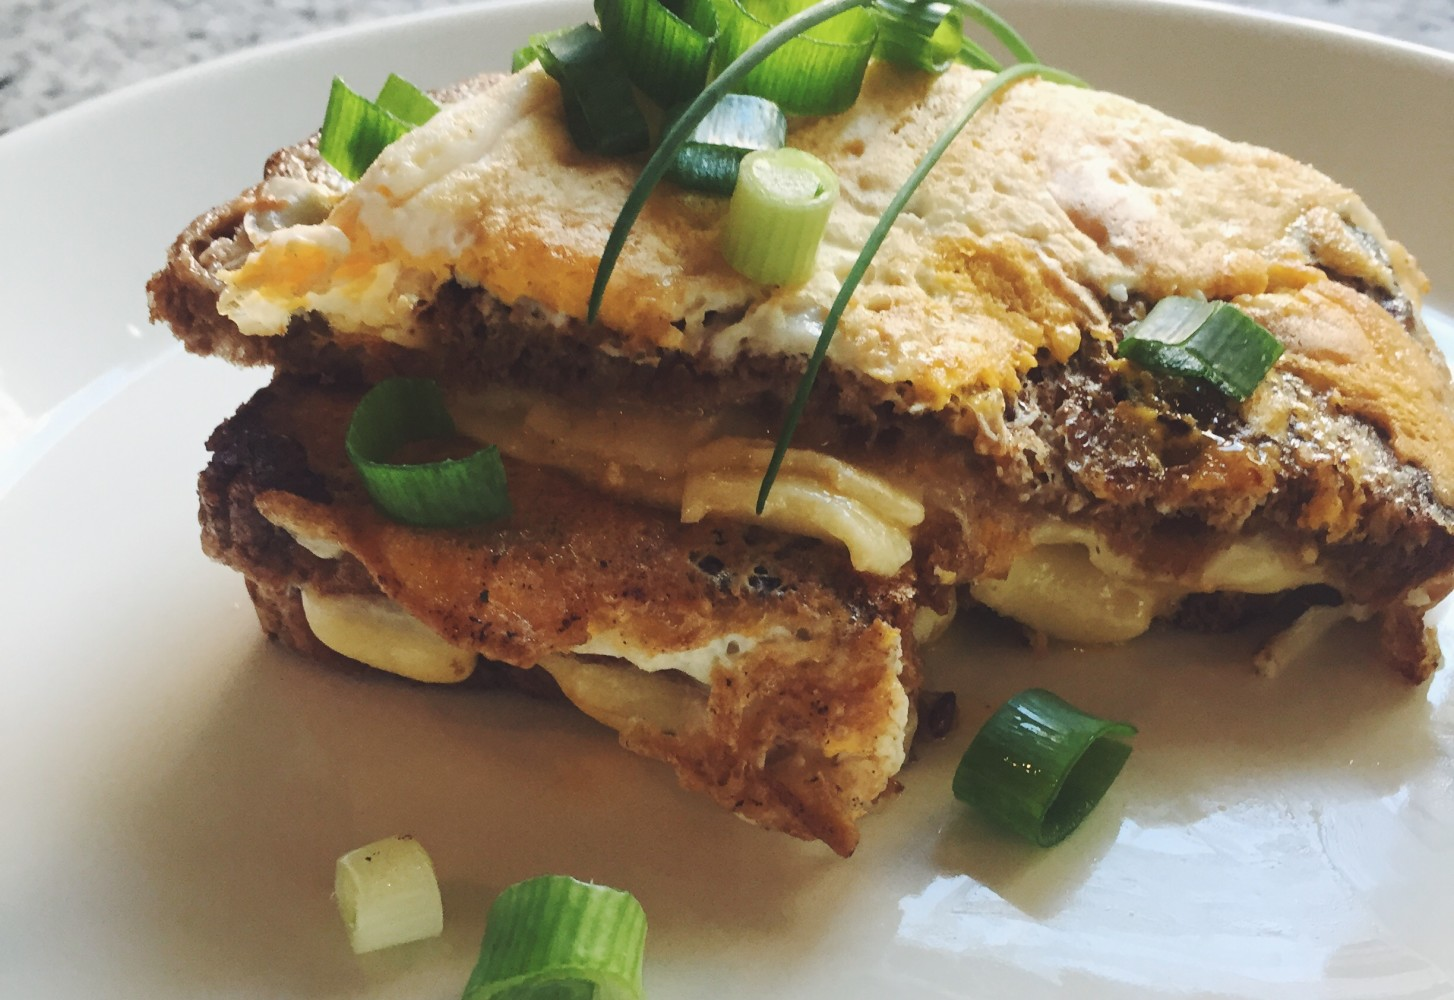 Omelet + tosti = omelosti: Koekenpantosti met ei en kaas